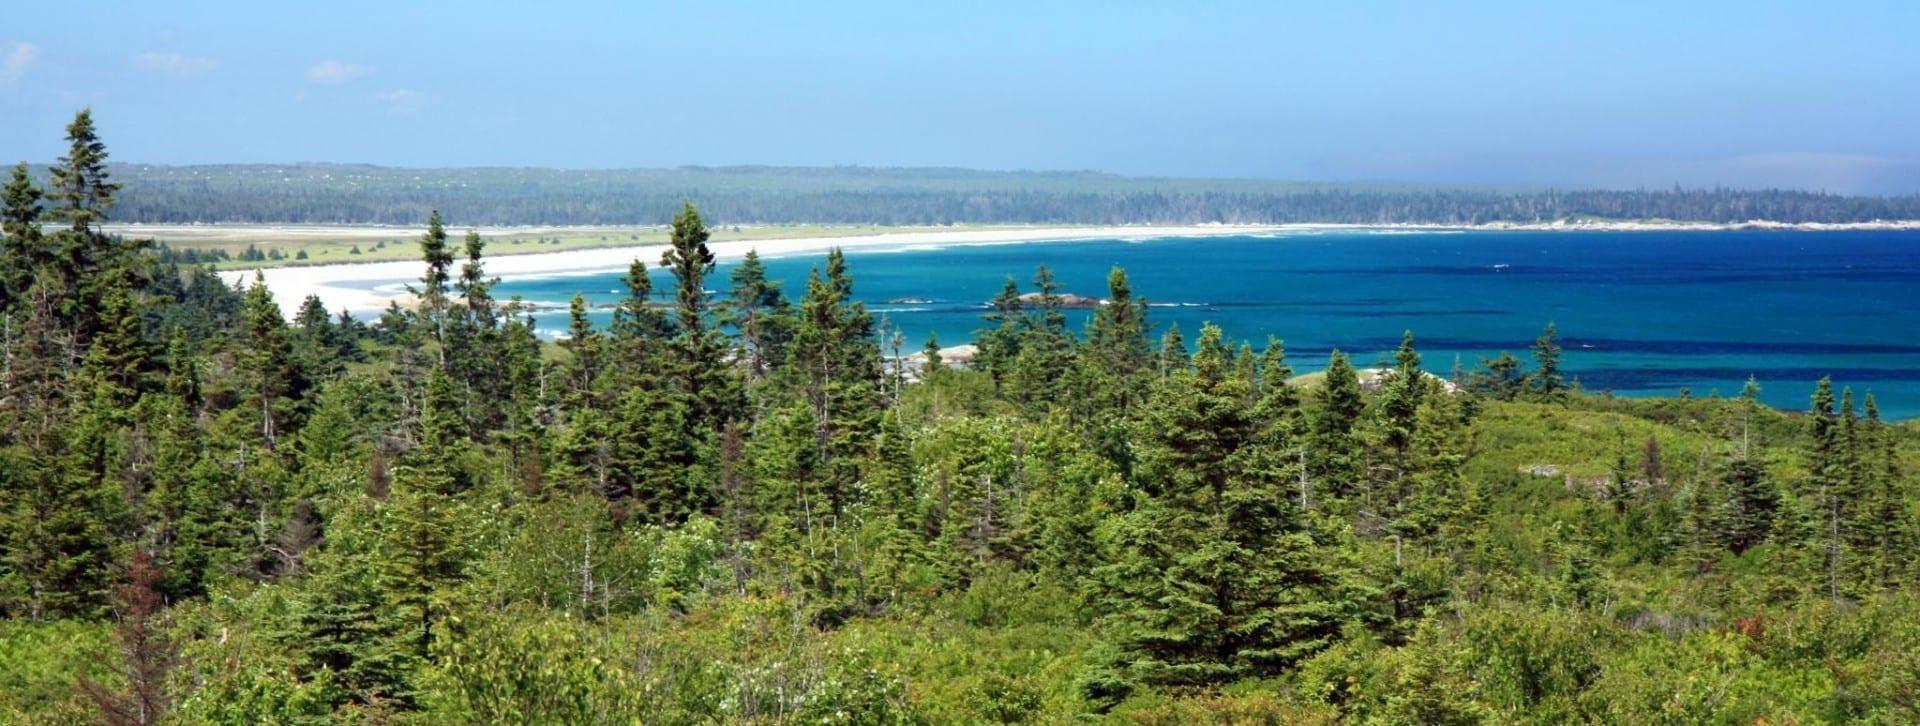 Kejimkujik Seaside Parque nacional Kejimkujik Canadá